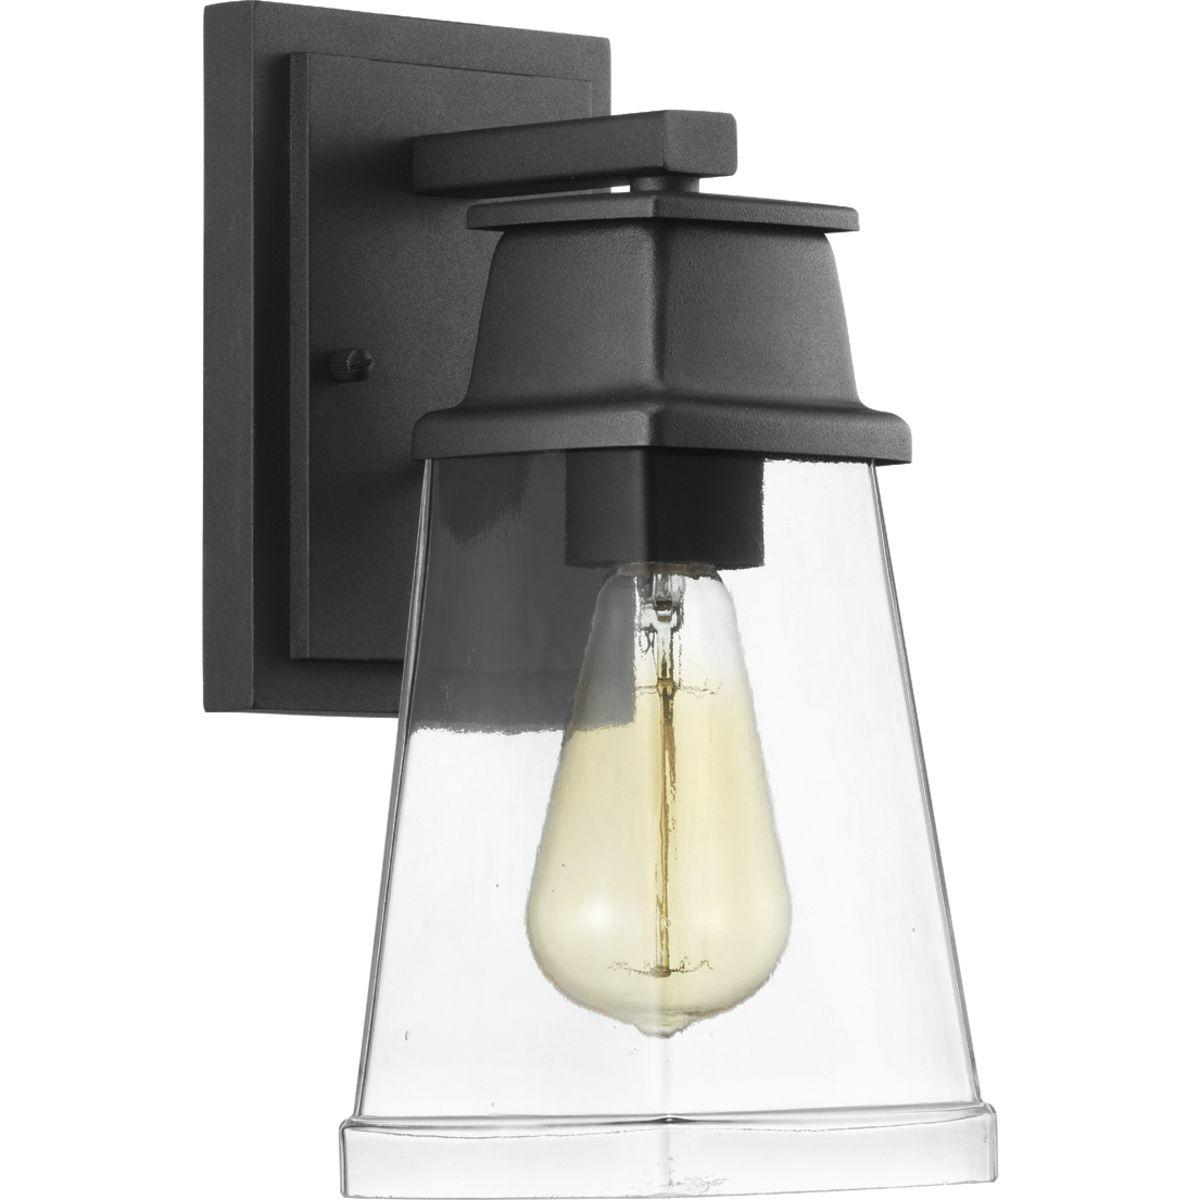 R5 Progress Lighting Strata 1-Light 5.5 in.Outdoor Black LED Wall Lantern Sconce